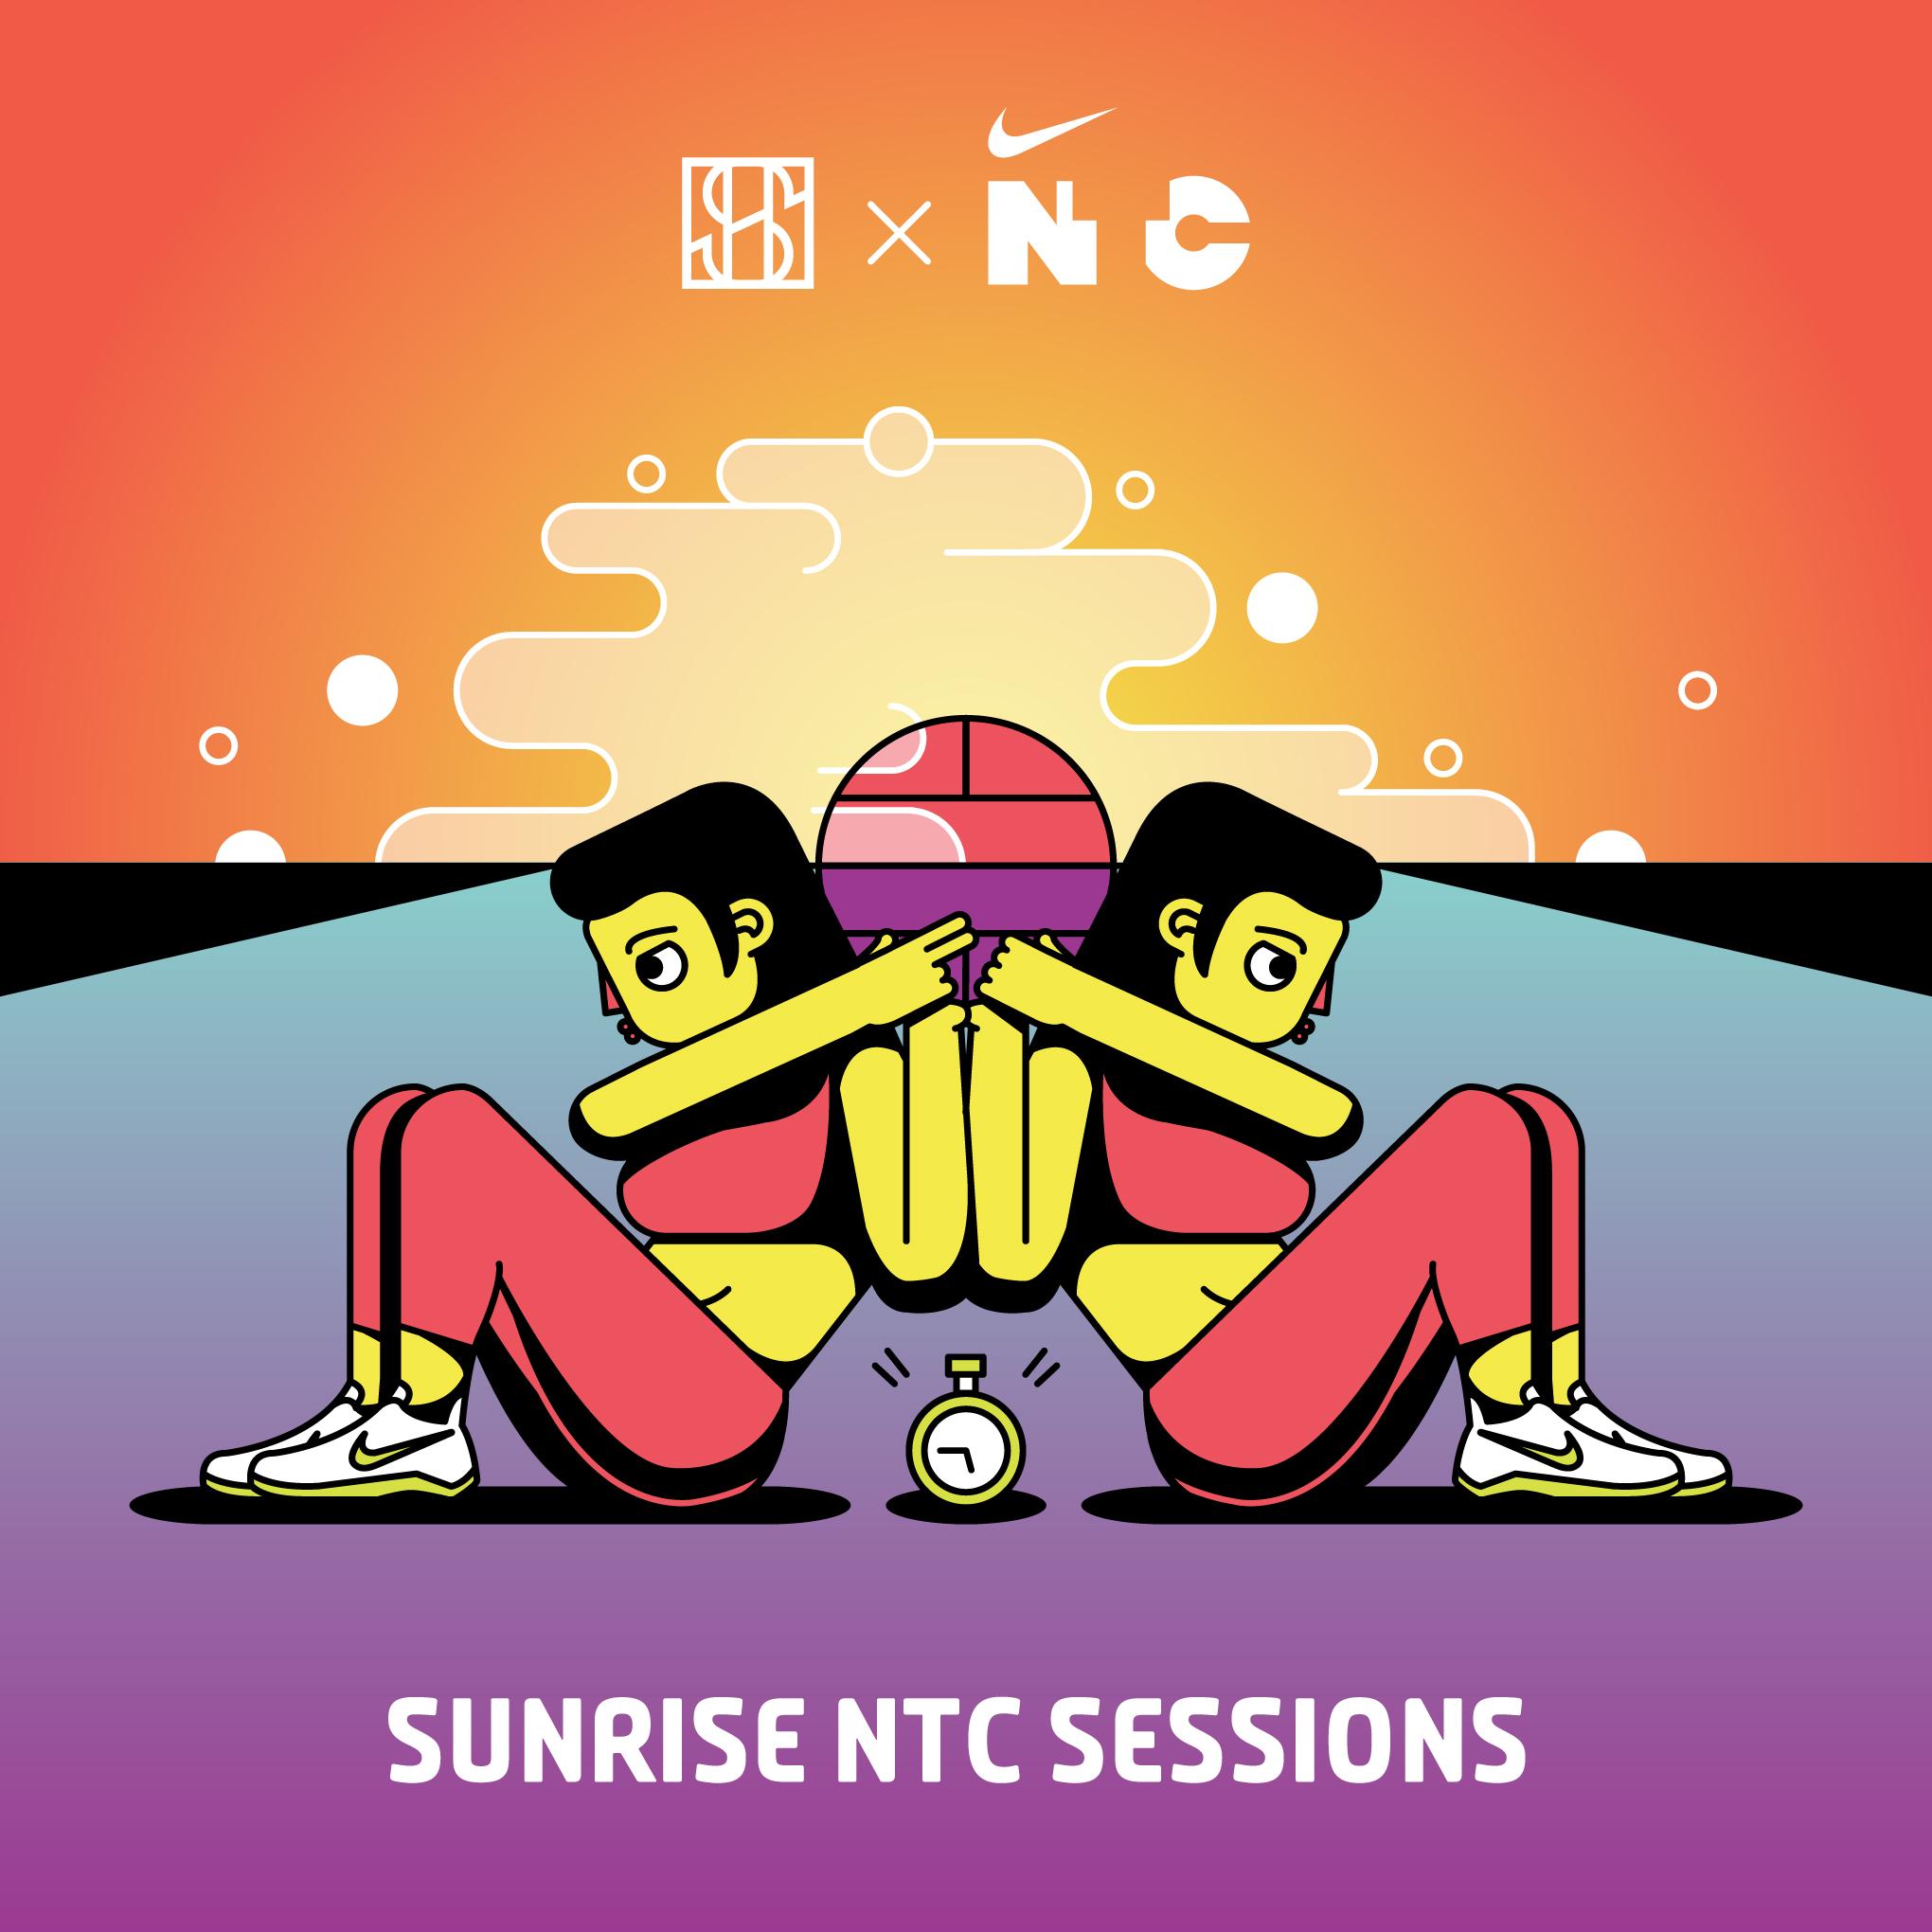 Sidewalk Hustle x Nike NTC Sunrise Sessions Square